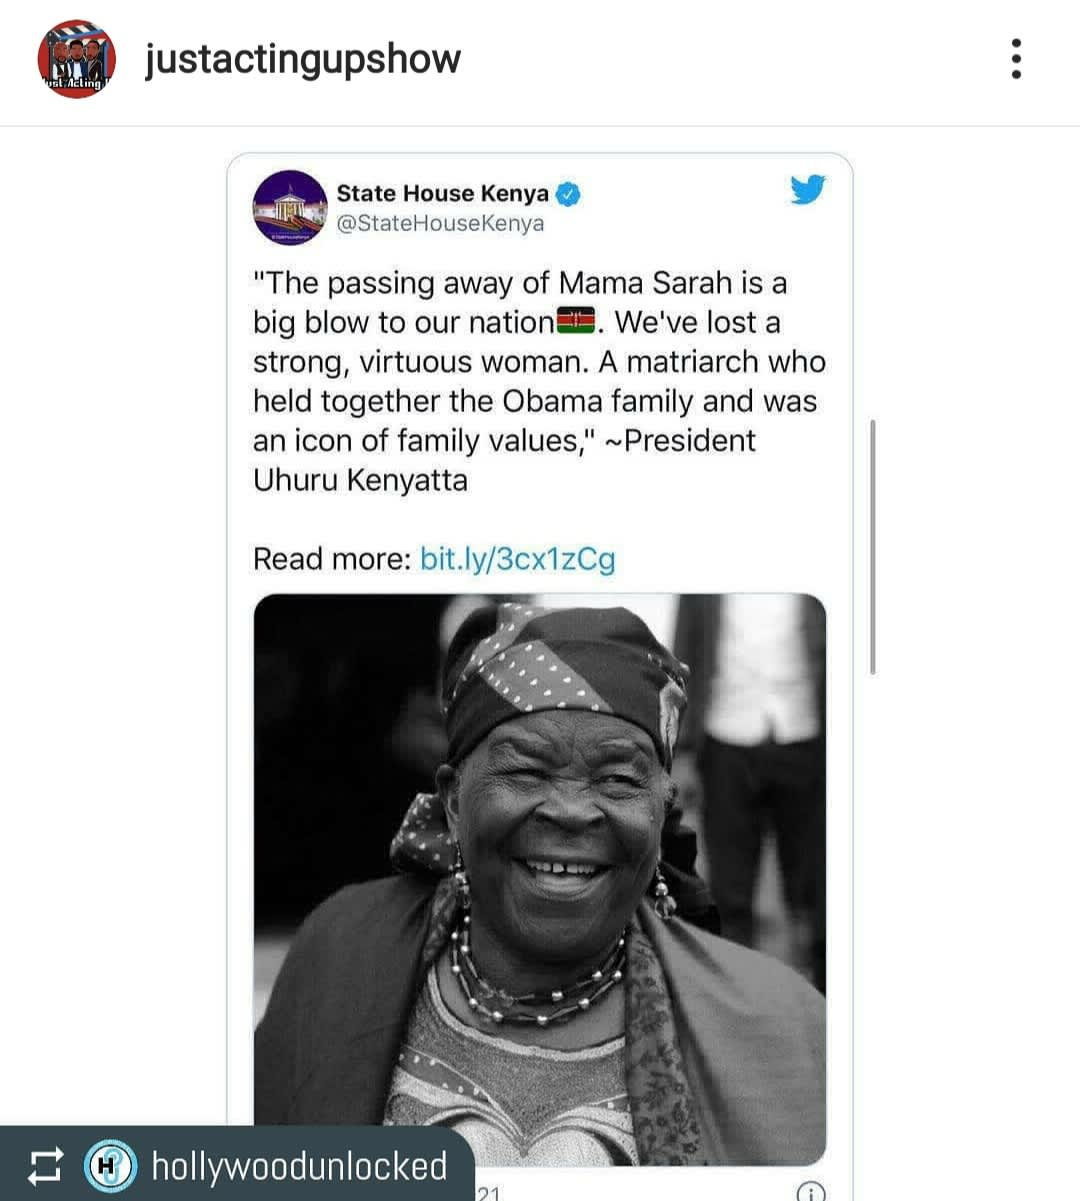 Barack Obama mourns the death of his grandmother Mama Sarah